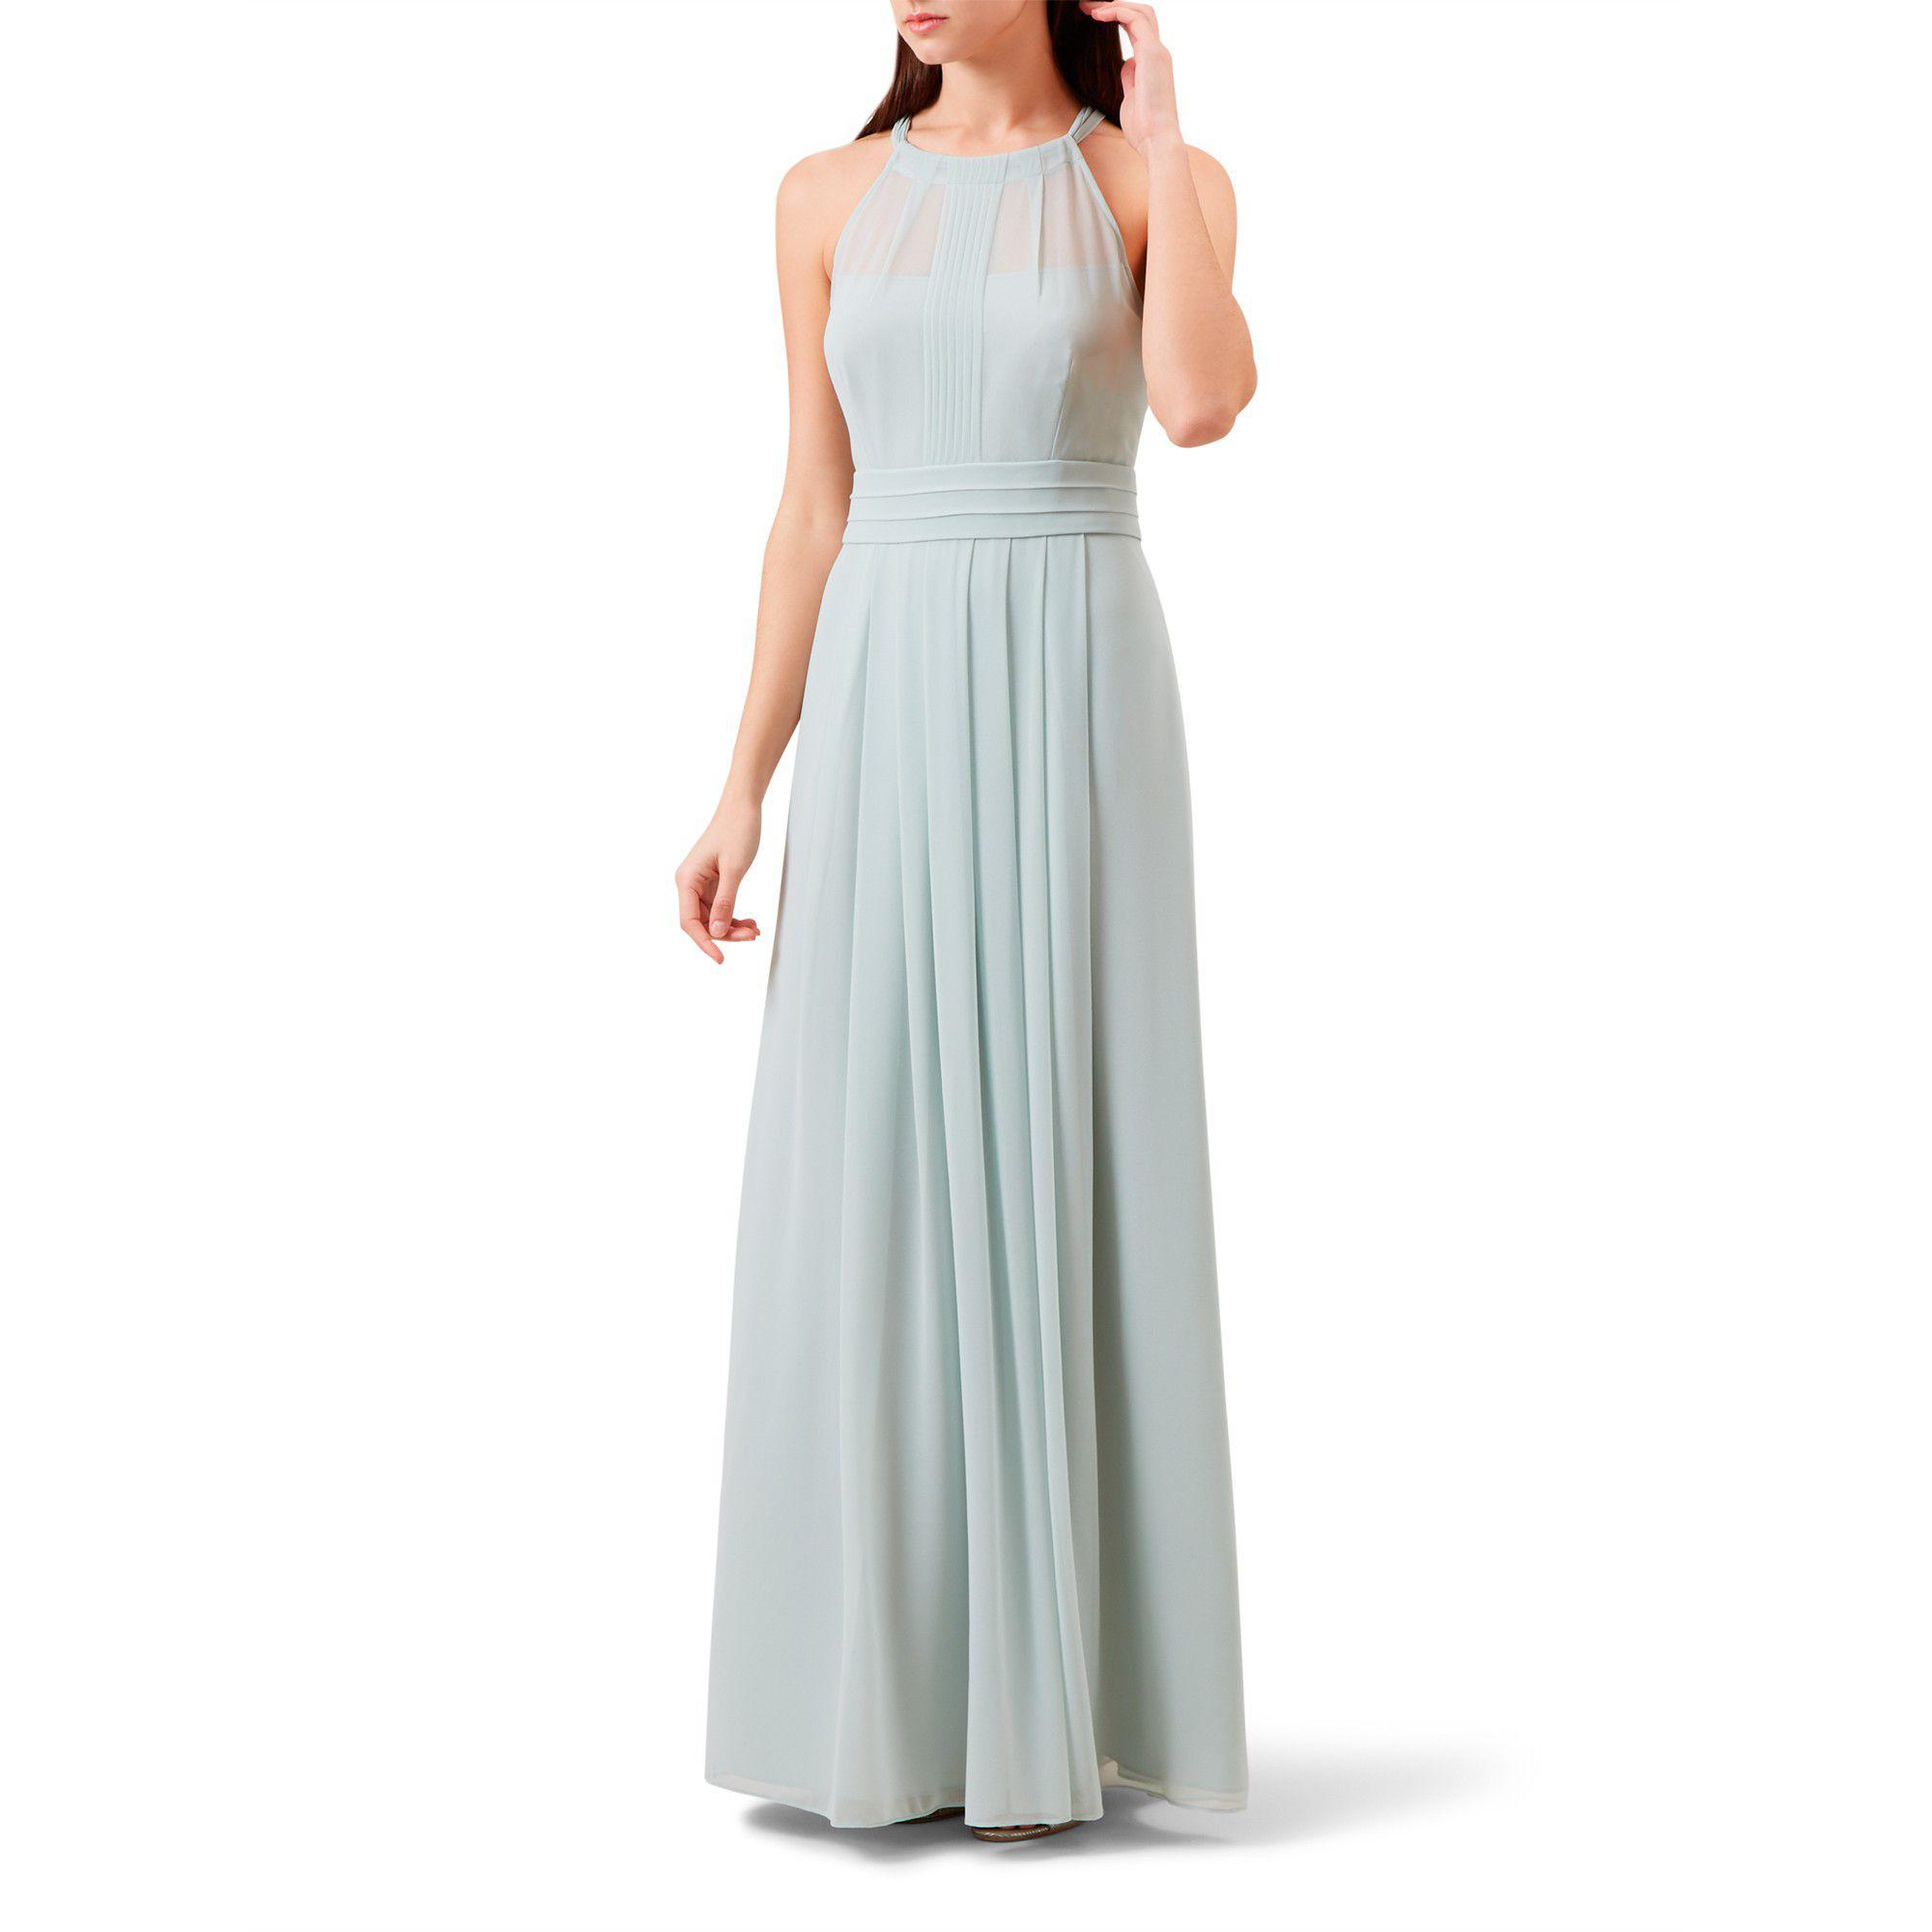 9c2f7d70ea9 Hobbs Mint  alexis  Dress in Green - Lyst